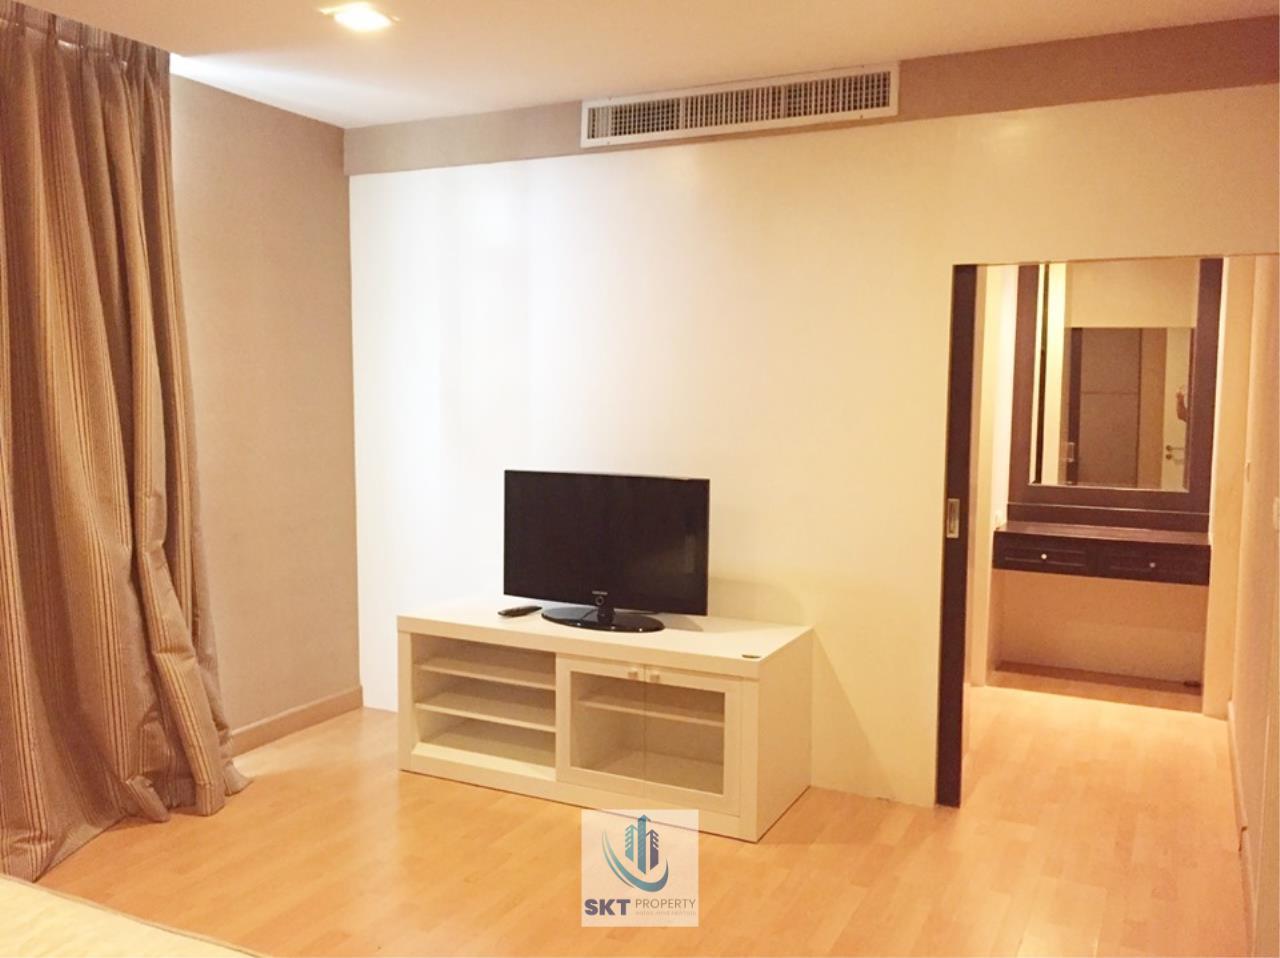 Sukritta Property Agency's Nusasiri grand condo neat BTS Ekamai 8